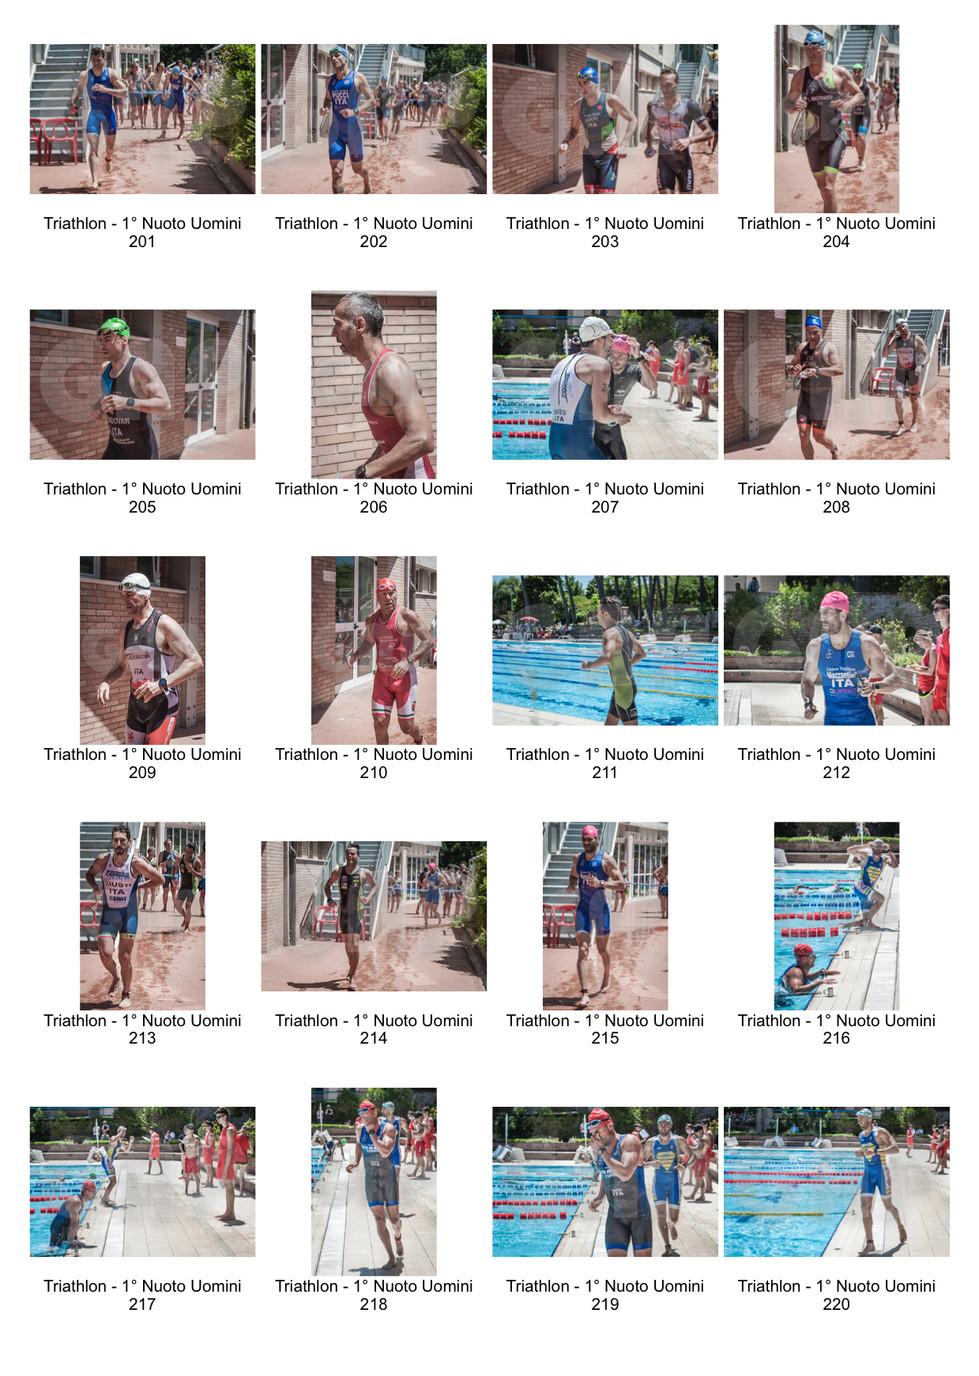 Triathlon_V.Elsa_-_1°_Frazione_Nuoto_Uomini_-11.jpg